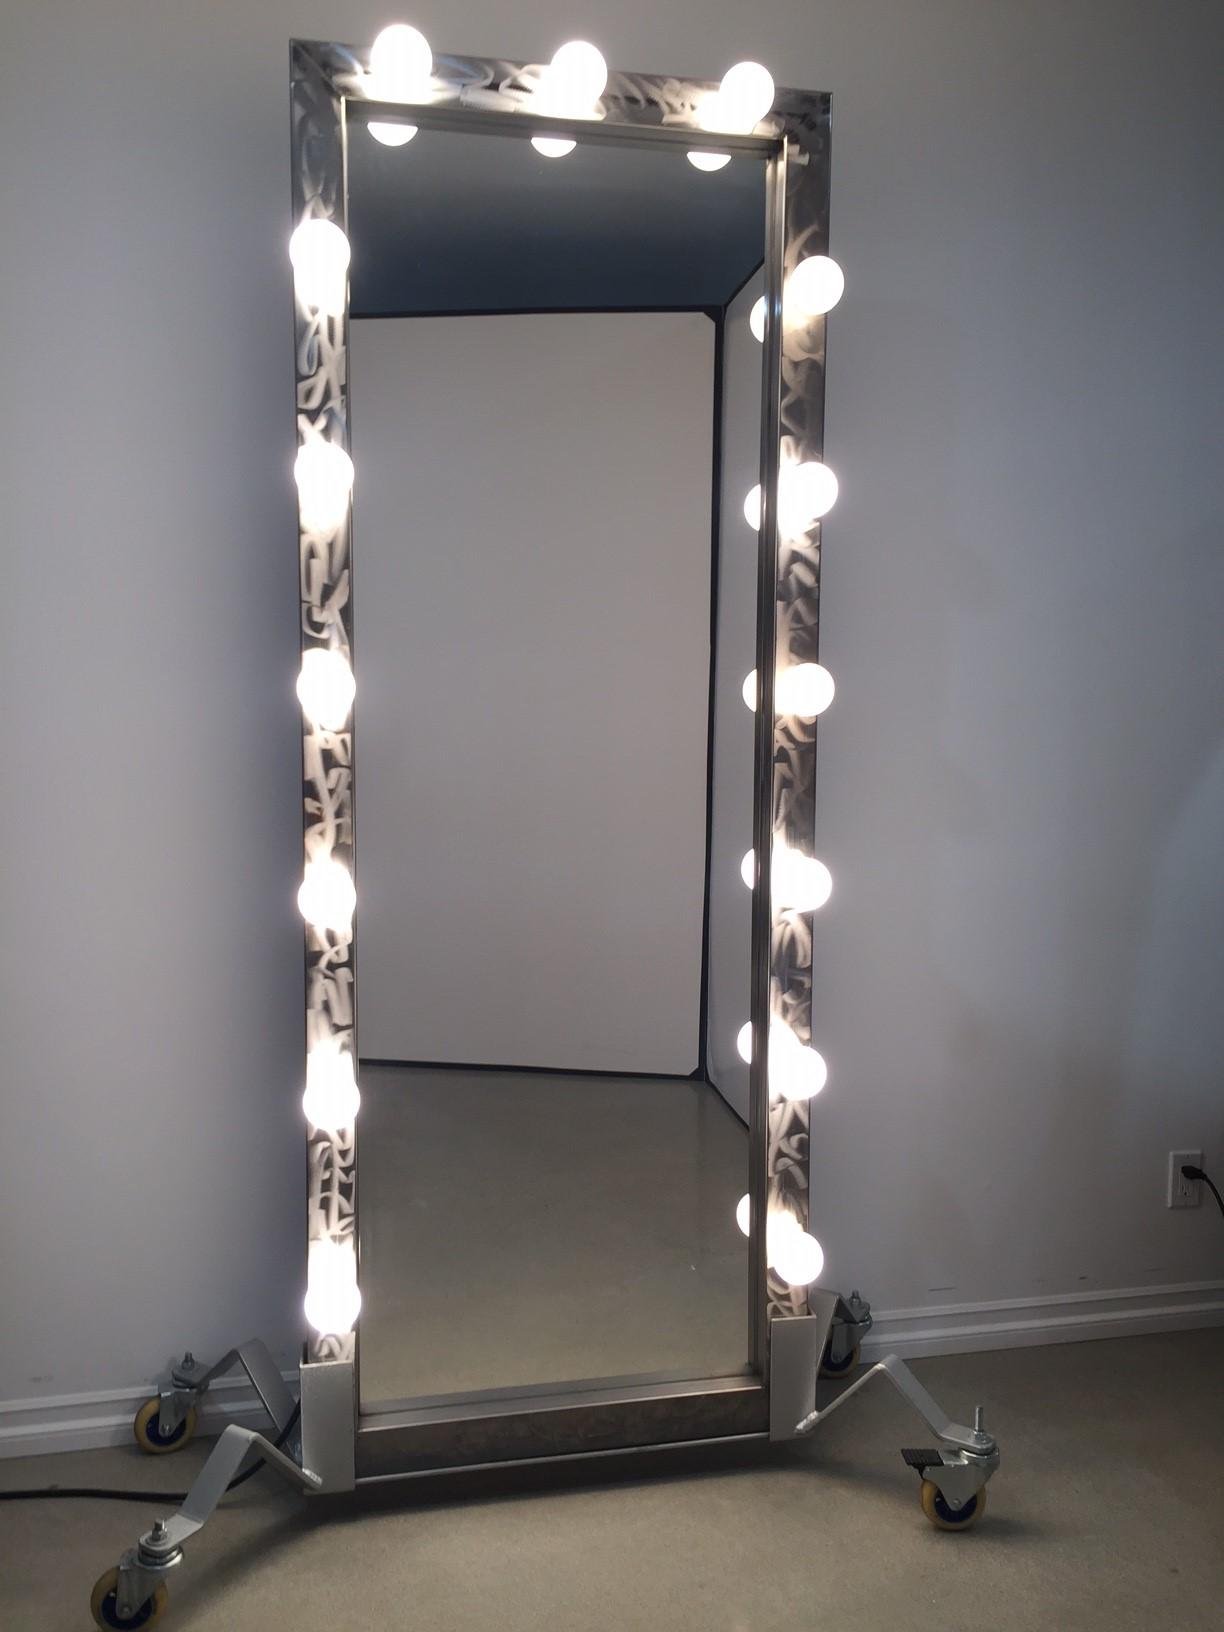 Make Up Tablesvanity Mirror Rentals